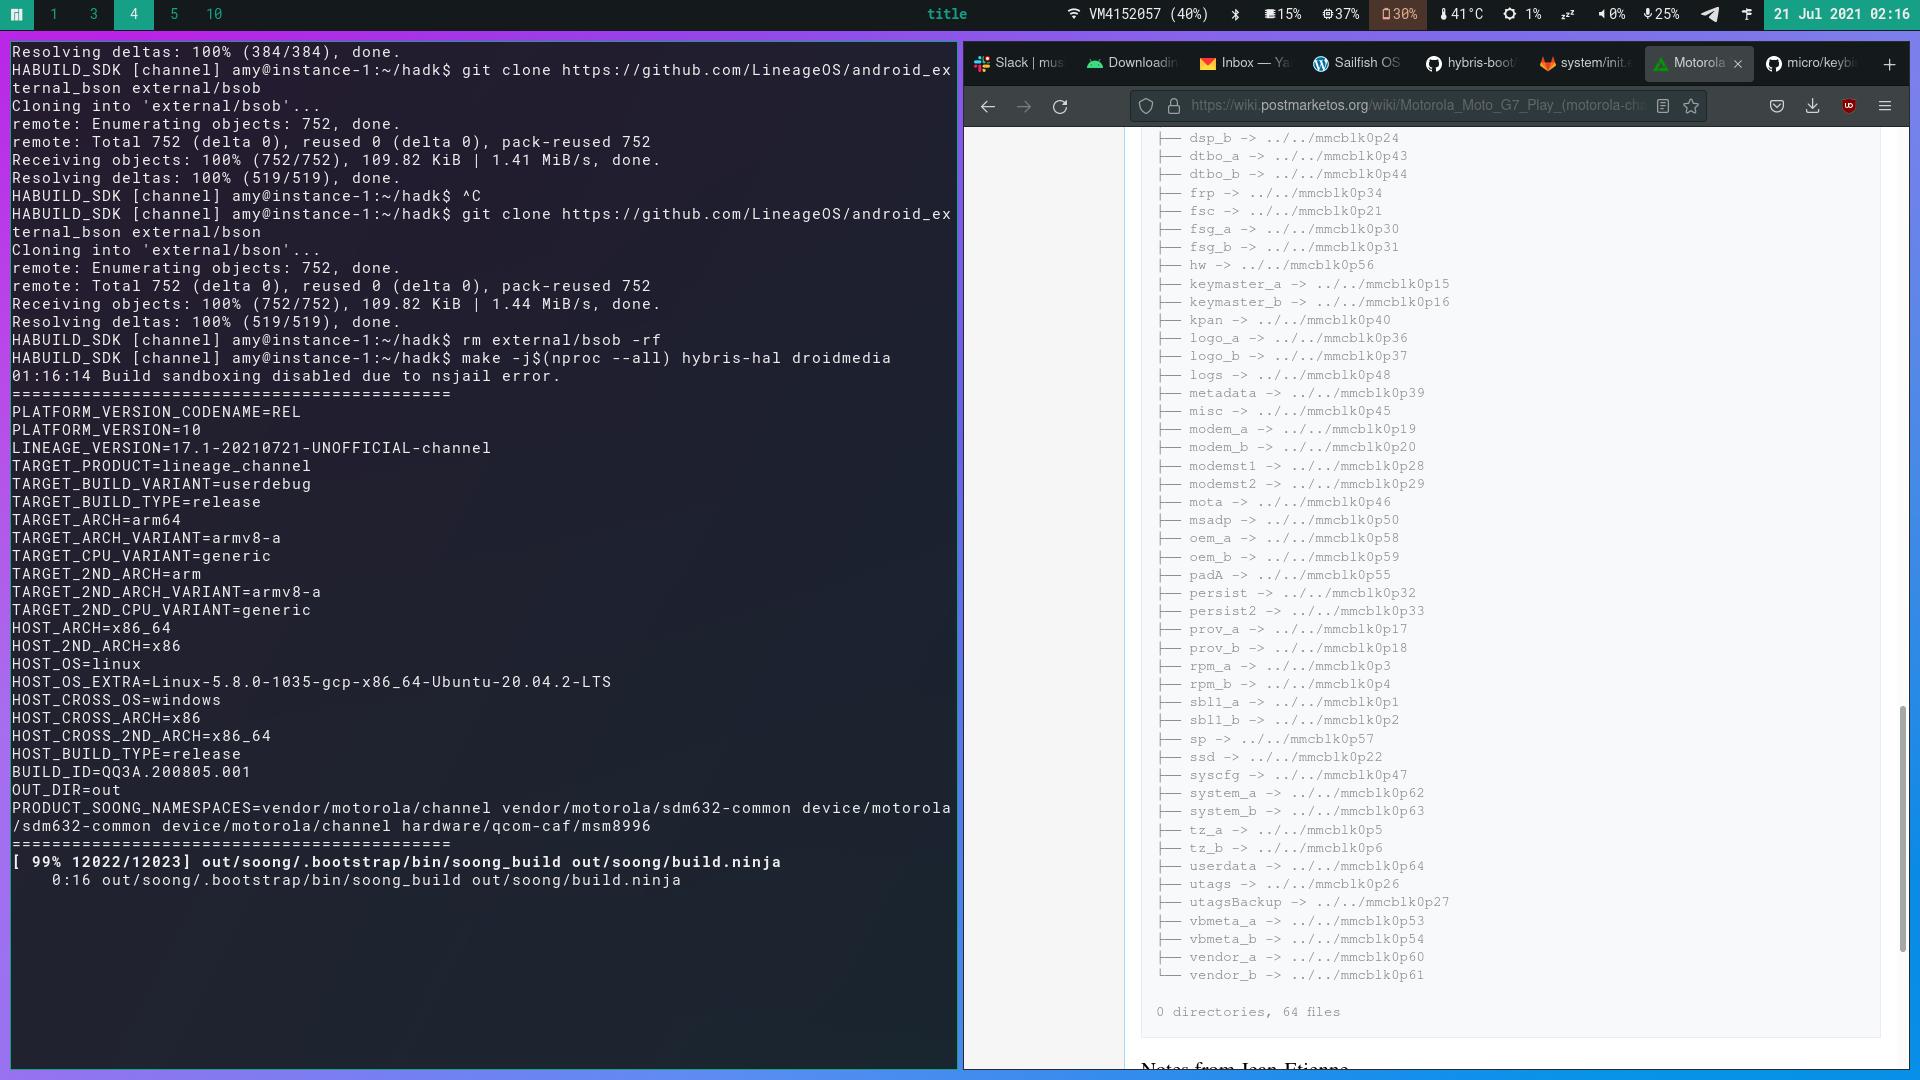 https://cloud-euhw9fgsb-hack-club-bot.vercel.app/020210721_02h16m32s_grim.png